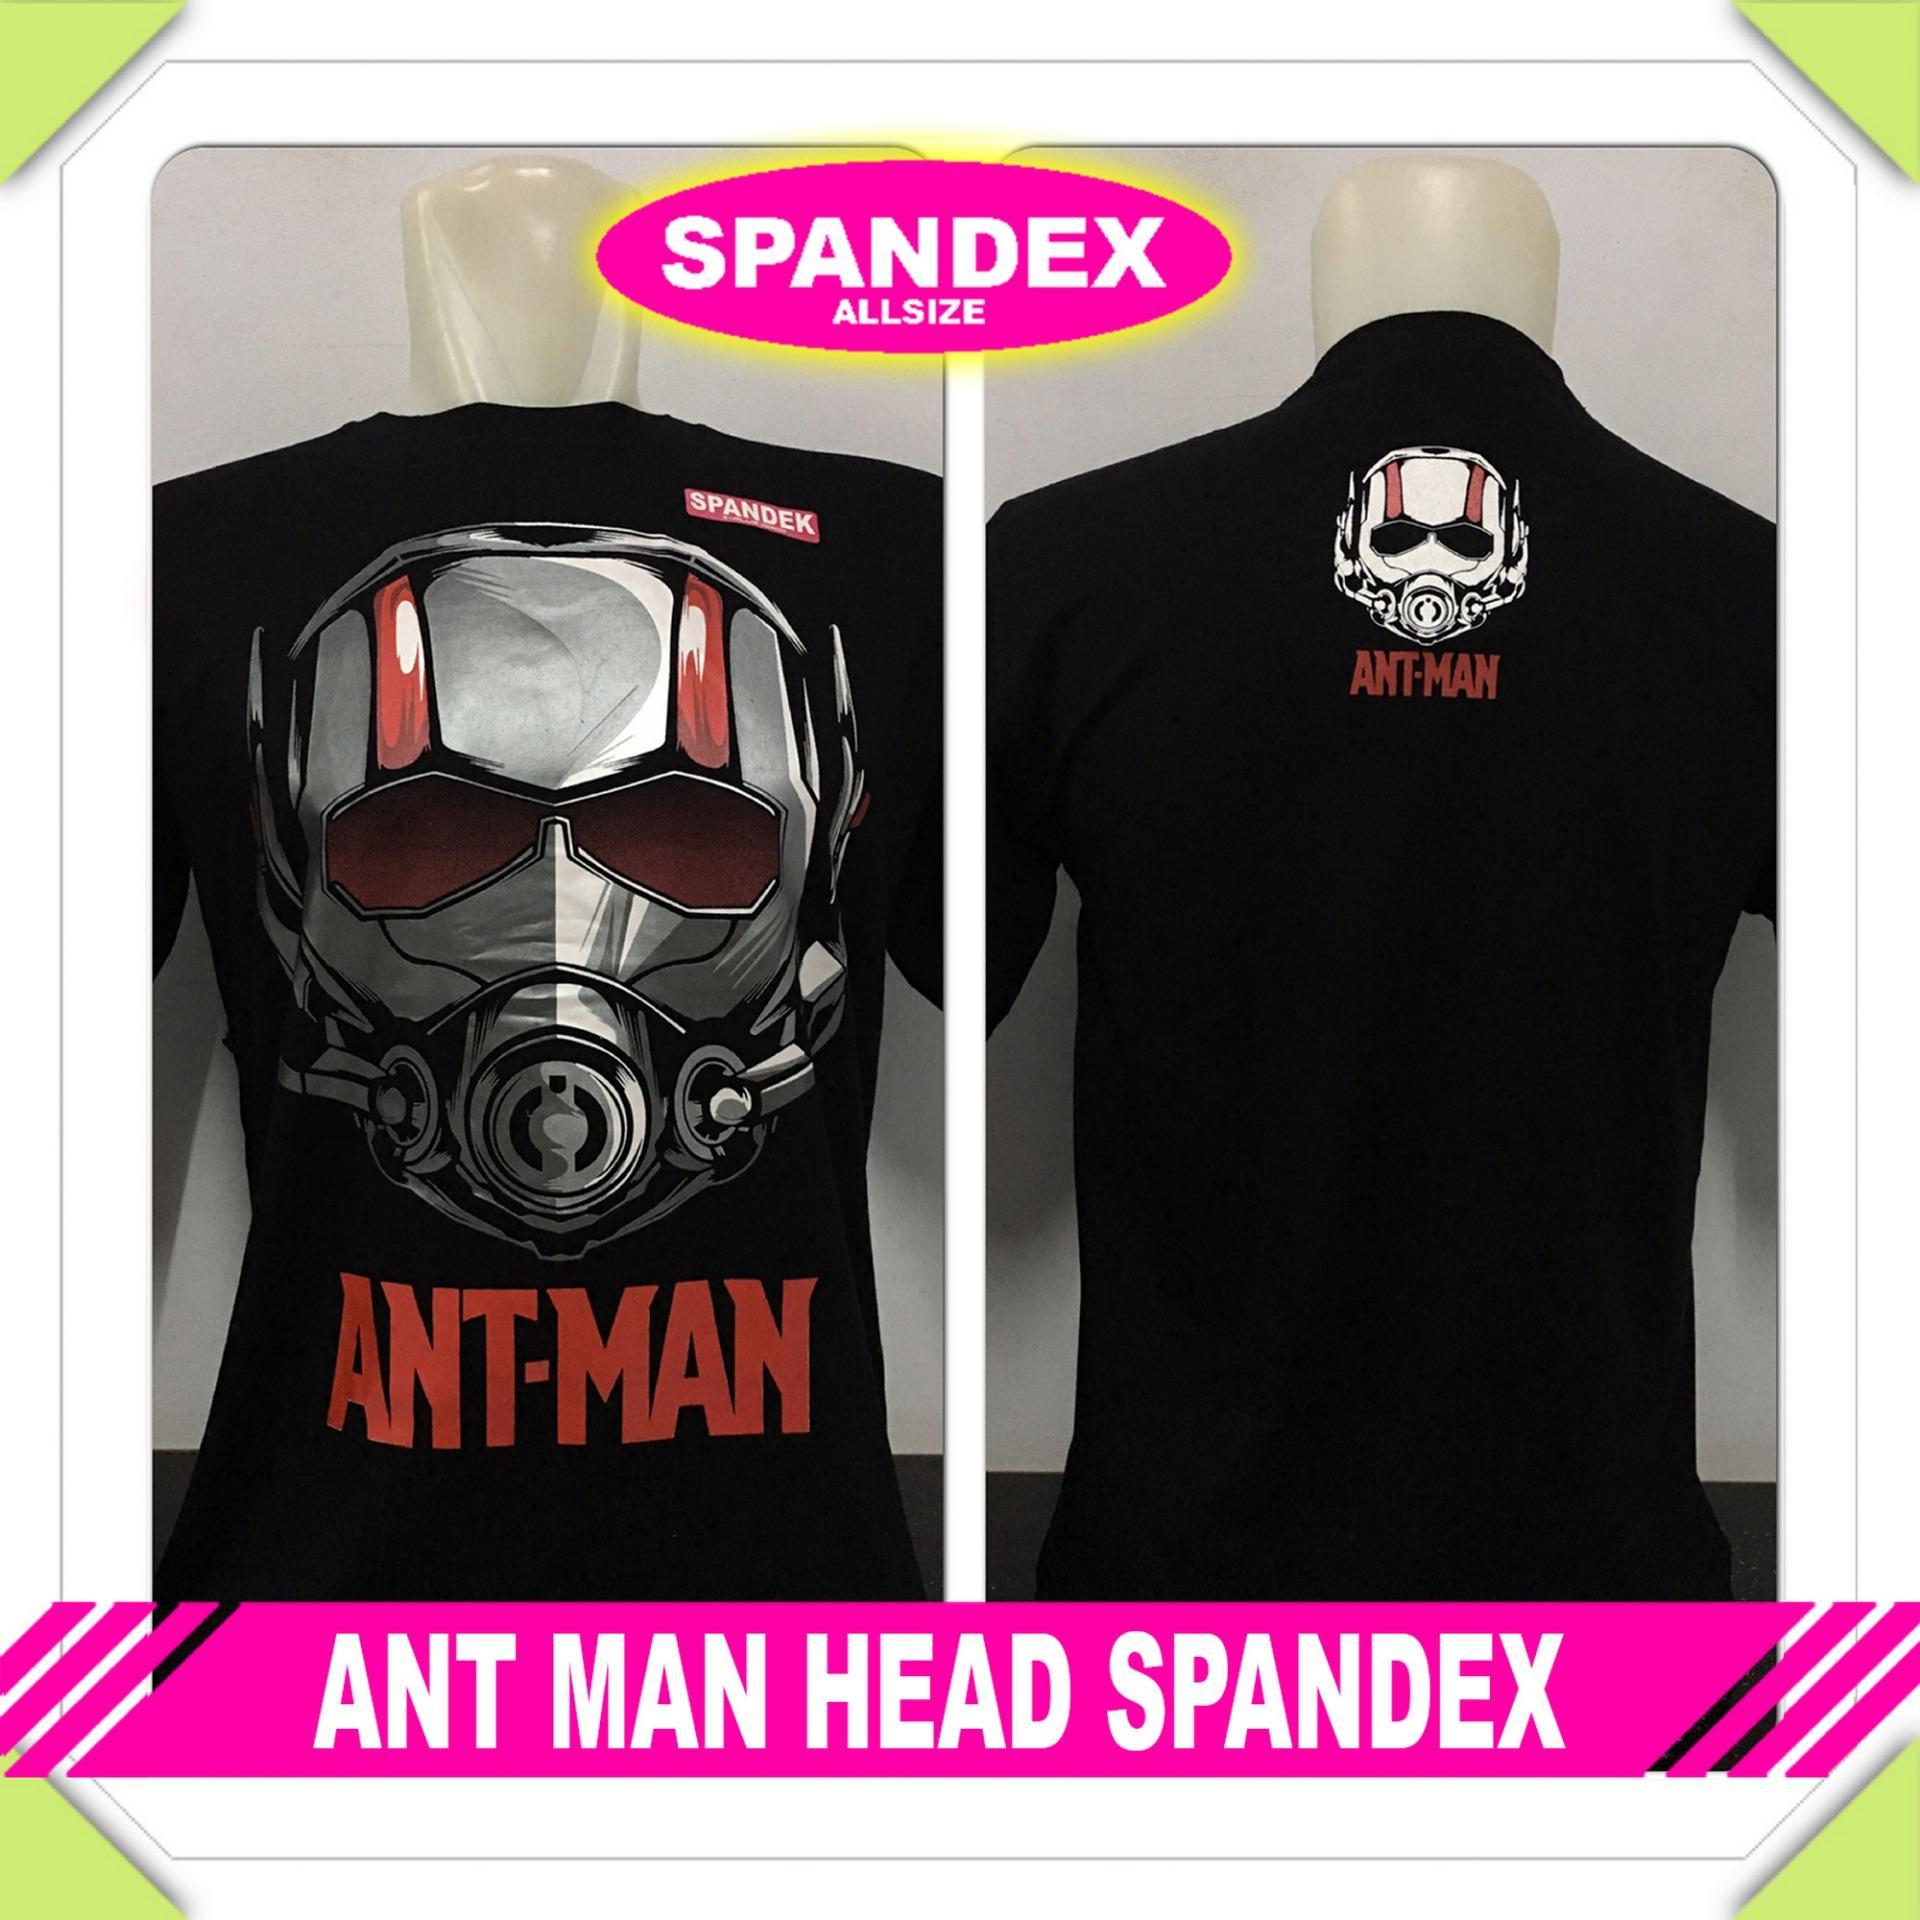 GraceStore - Kaos T-Shirt Distro / kaos Pria / Tshirt Pria / Distro Pria / Baju Pria Ant Man Head -